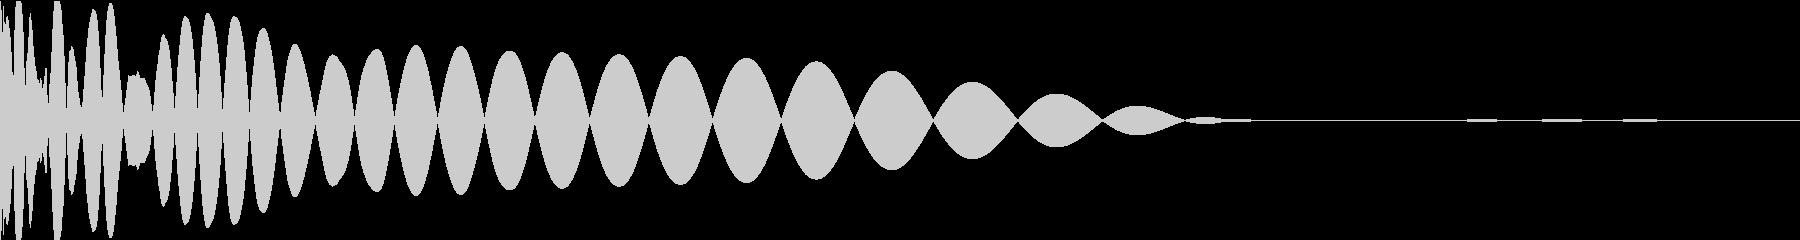 DTM Kick 5 オリジナル音源の未再生の波形